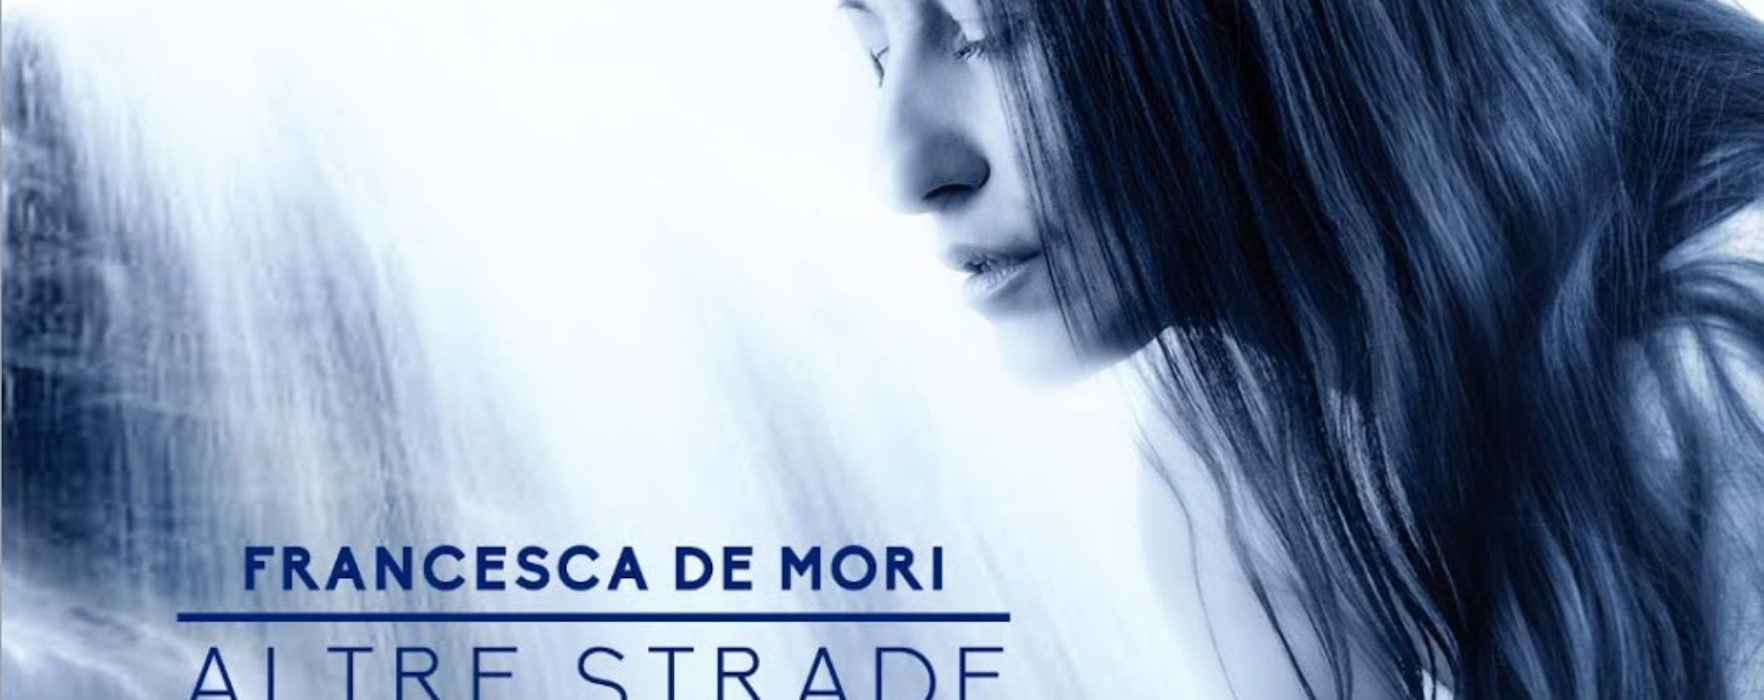 "Francesca De Mori, ""Altre strade"": la recensione"